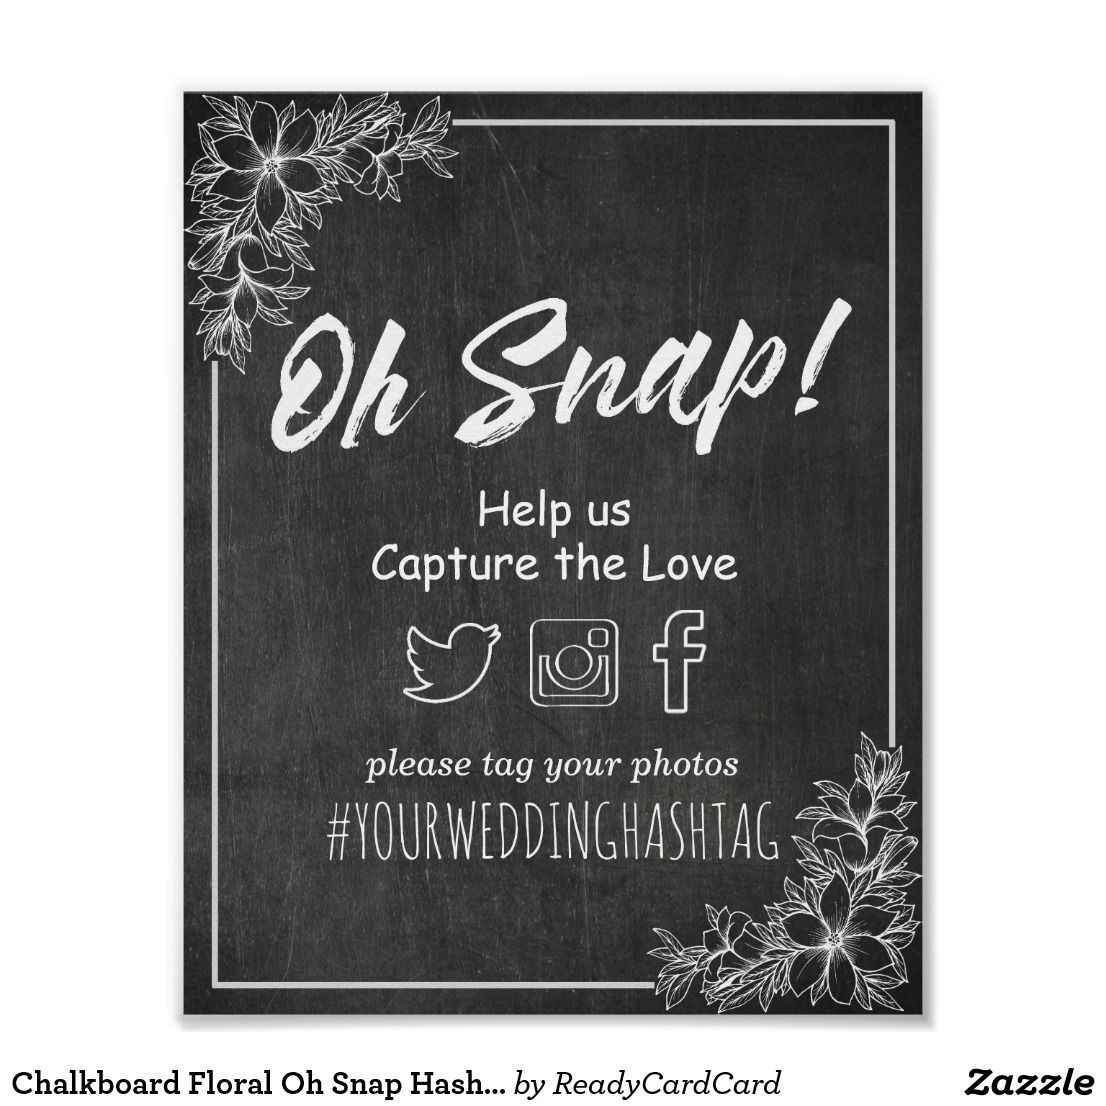 Wedding Hairstyle Hashtags: Chalkboard Floral Oh Snap Hashtag Wedding Decor